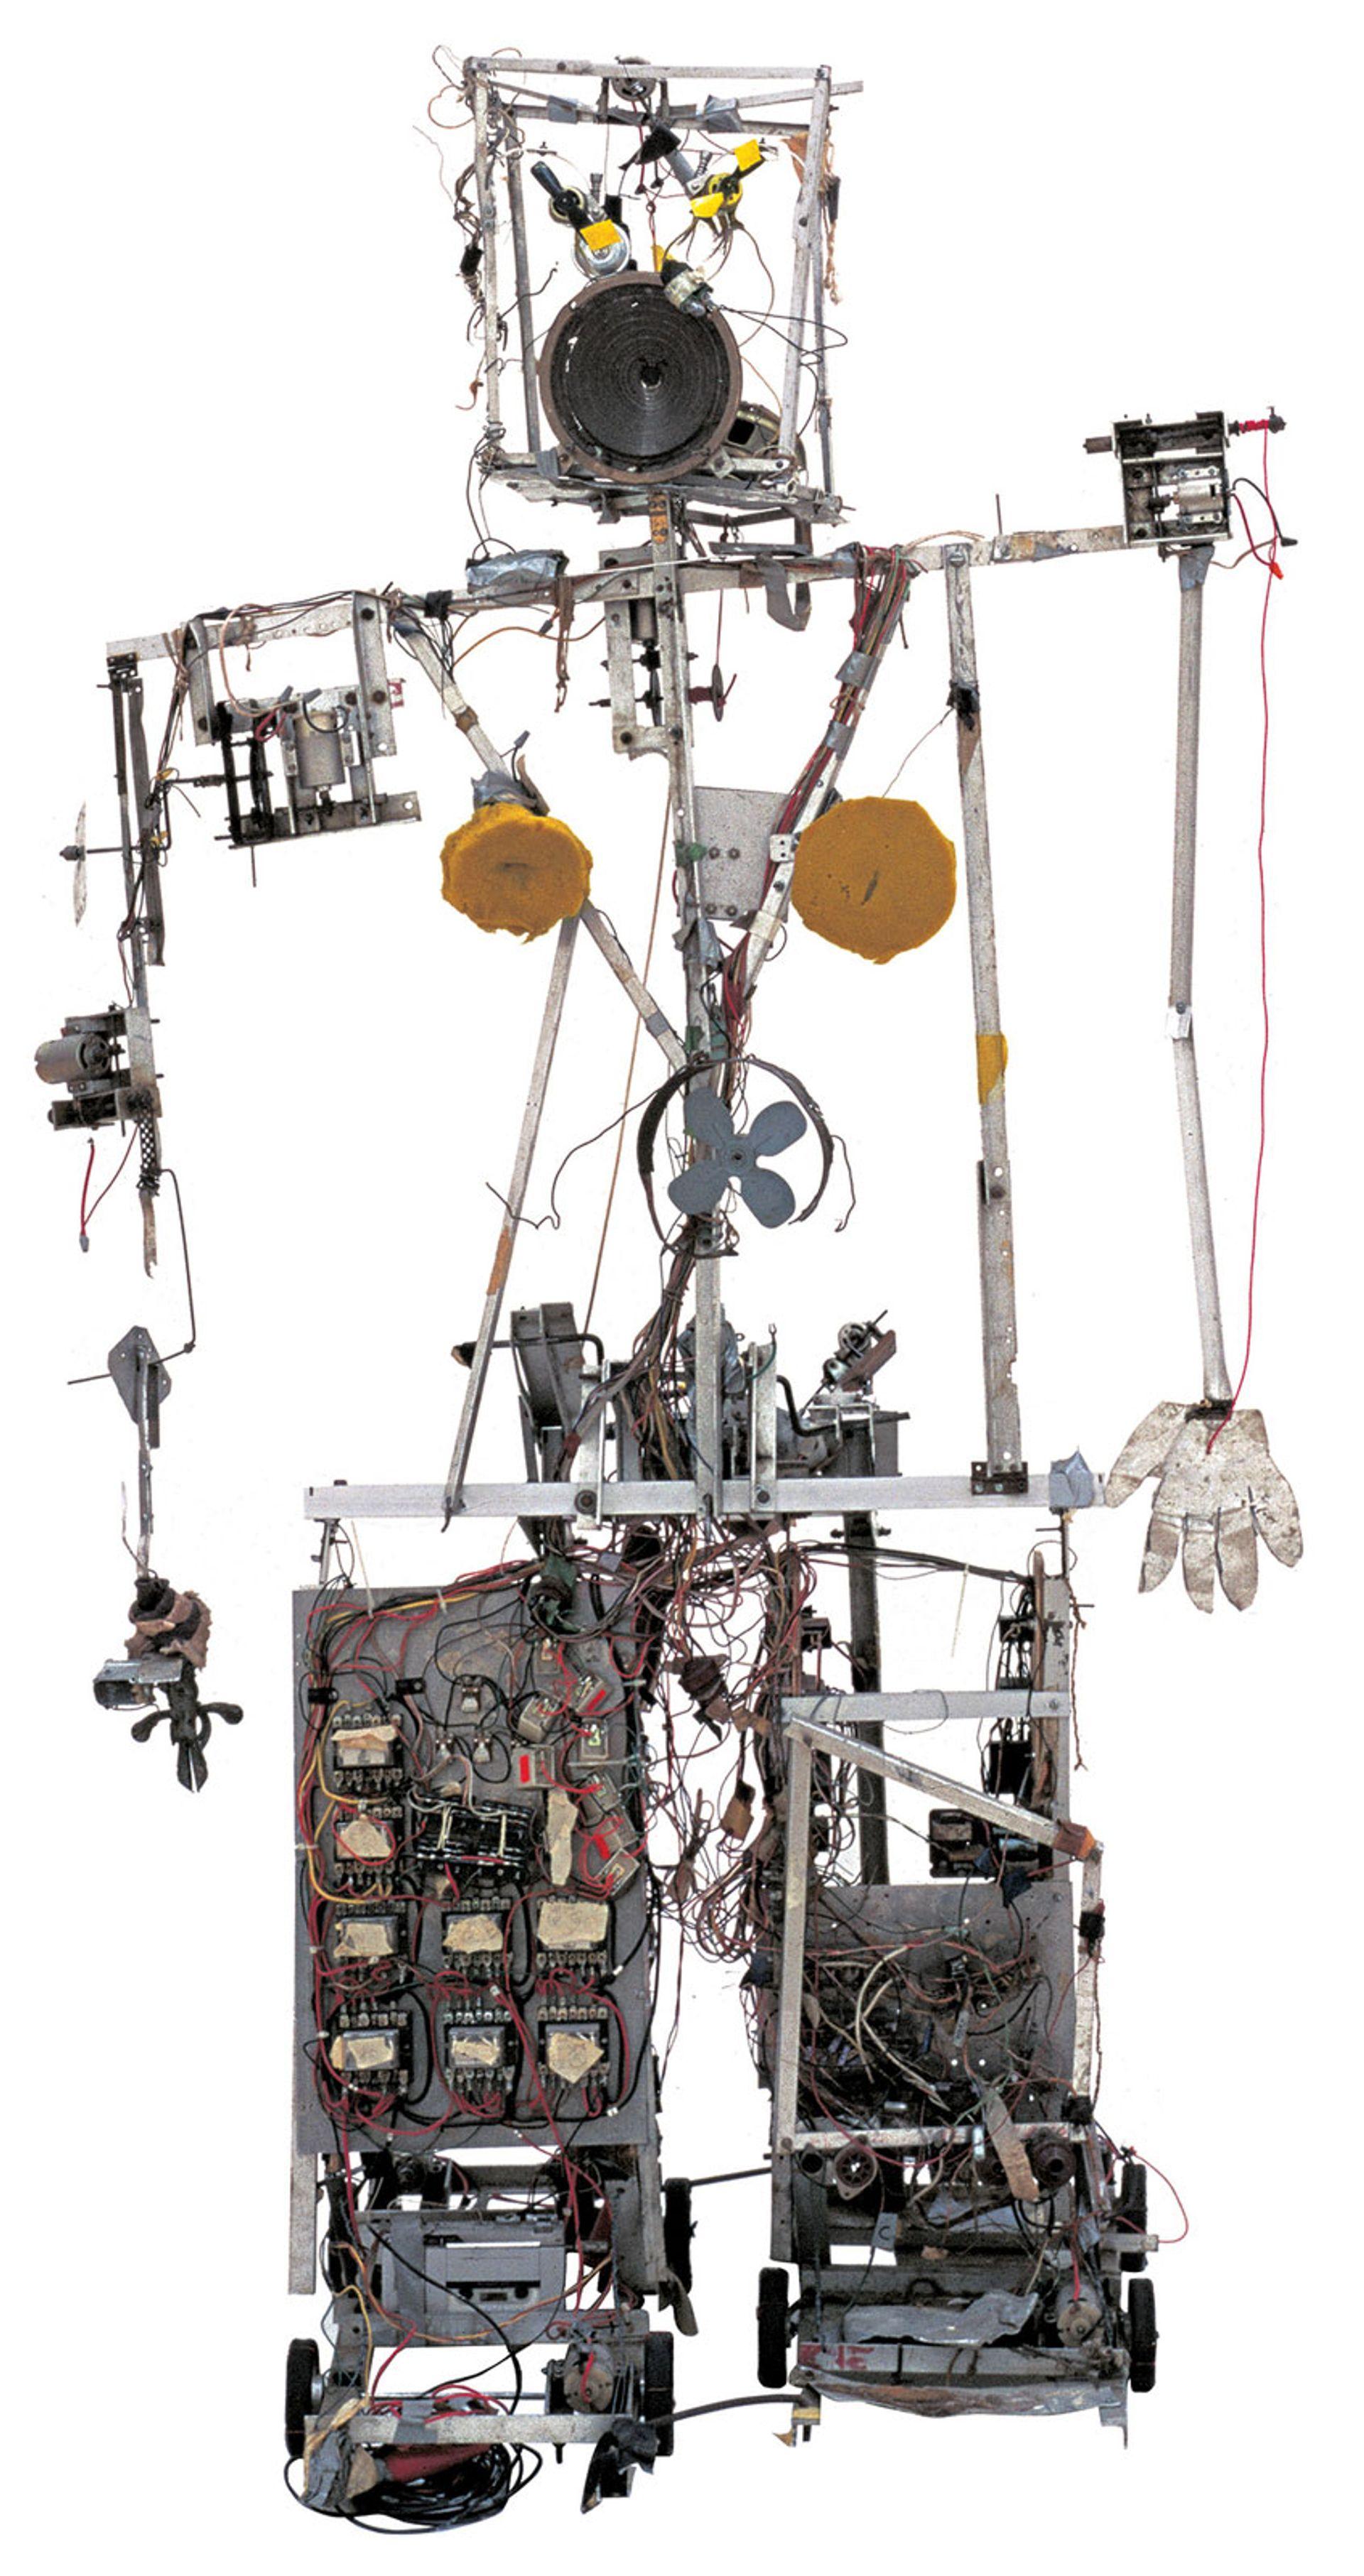 Nam June Paik's Robot K-456 (1964) © Courtesy Friedrich Christian Flick Collection in Hamburger Bahnof